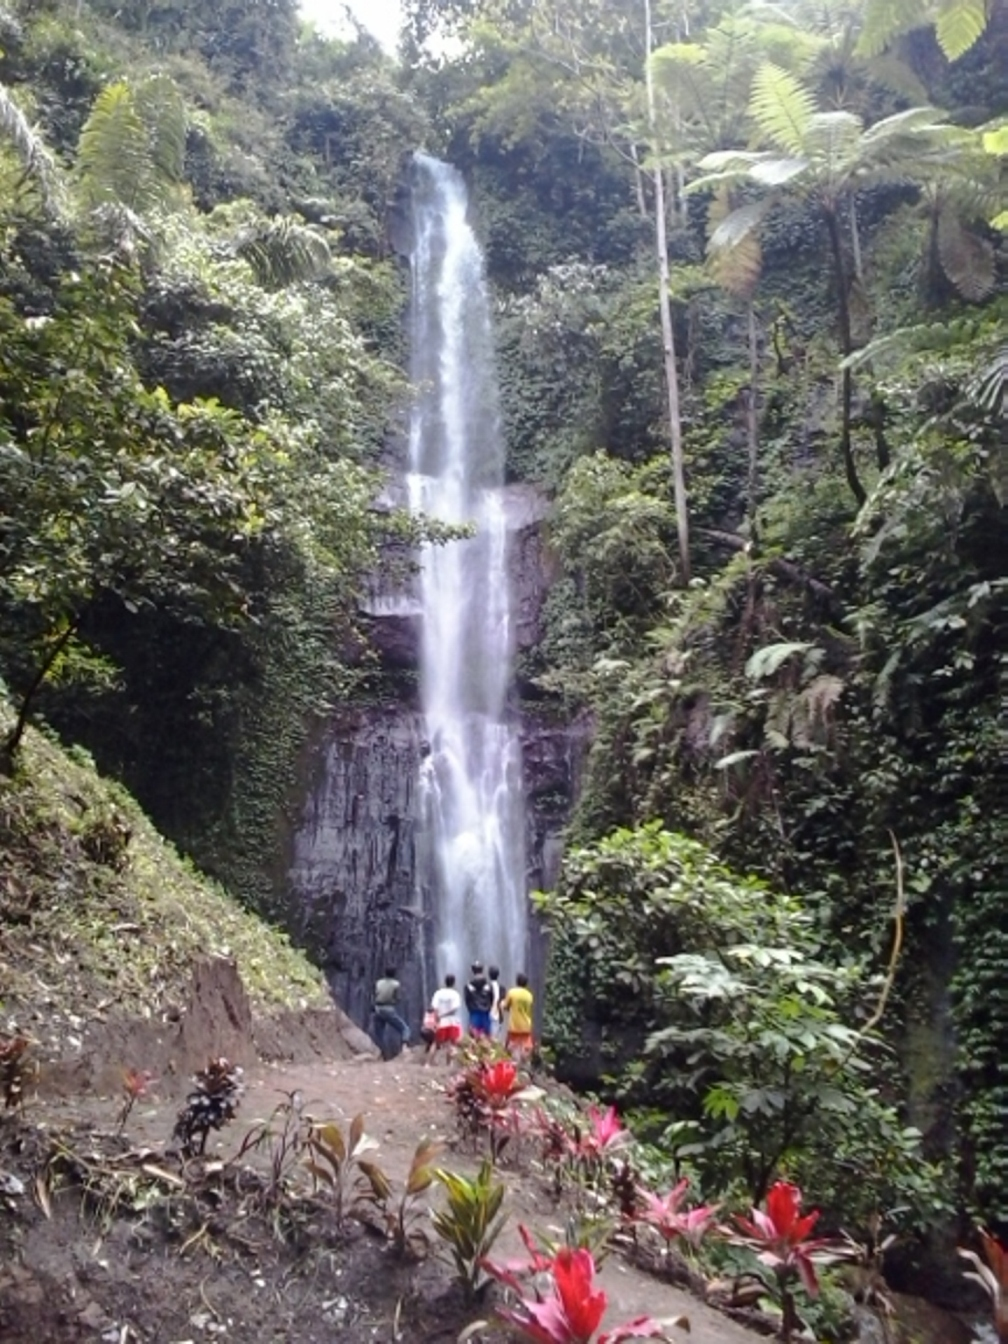 Coban Baung Air Terjun Anyar Eksotis Wisata Malang Gunung Kawi